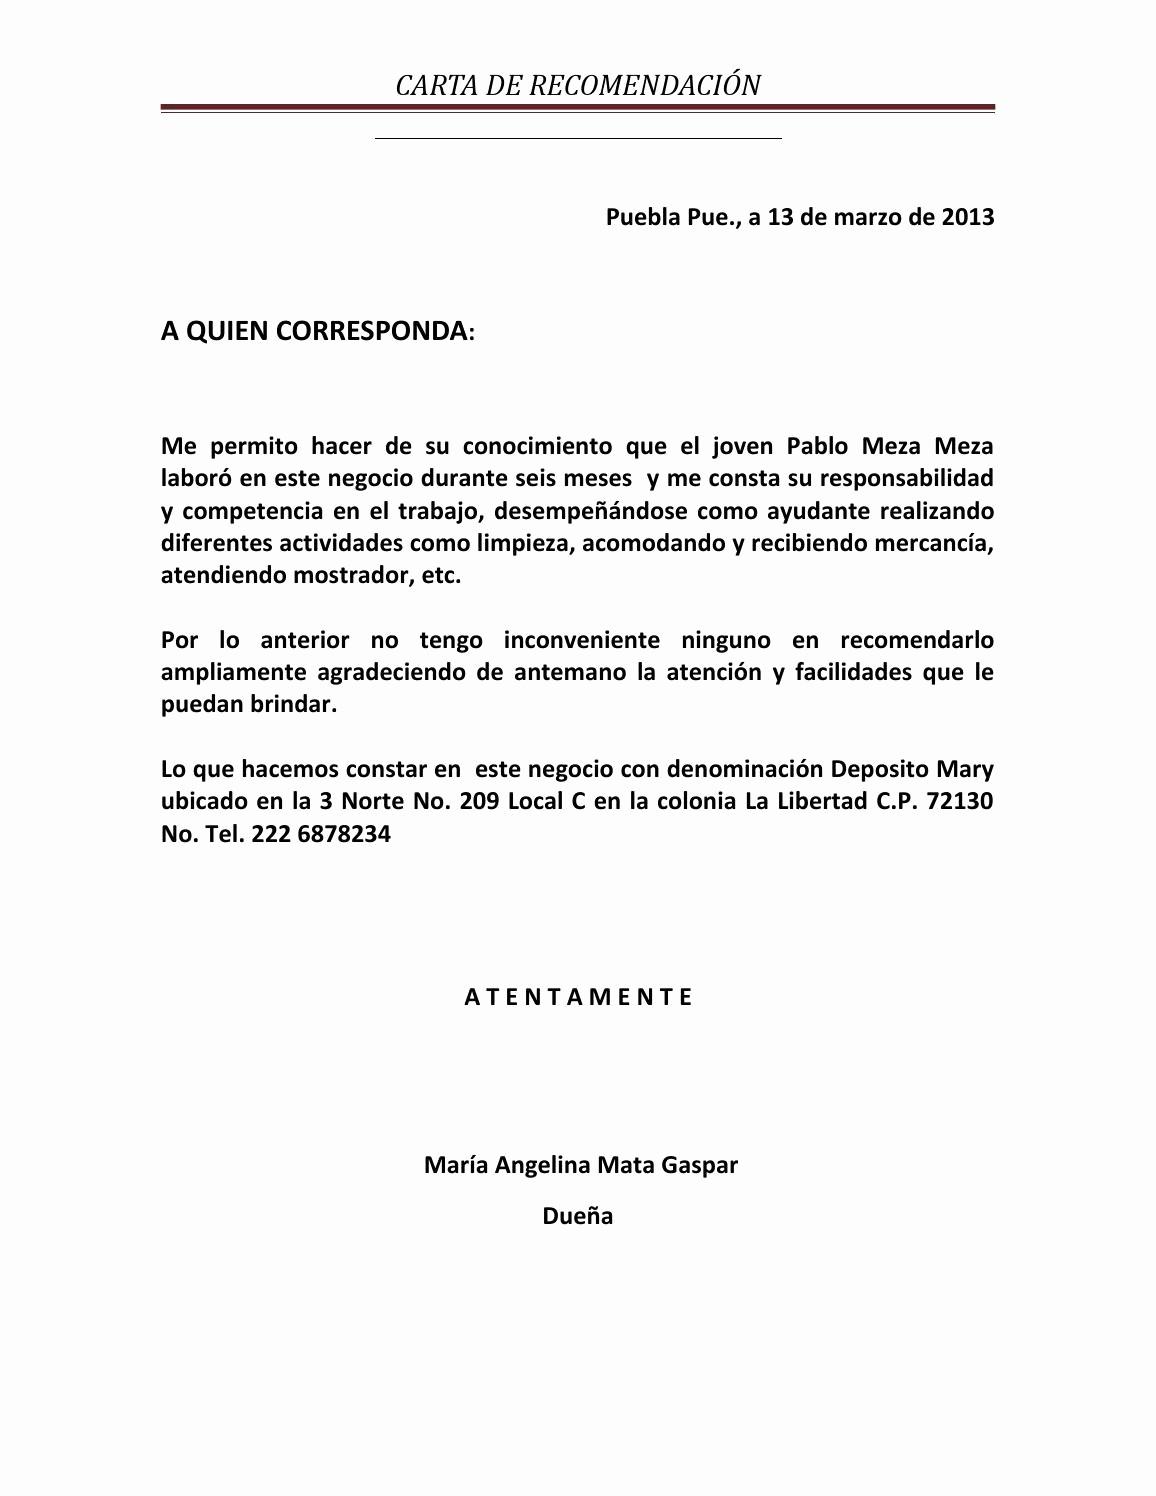 Formatos Carta De Recomendacion Laboral New Carta Re Endacion Pablom by Hilario issuu